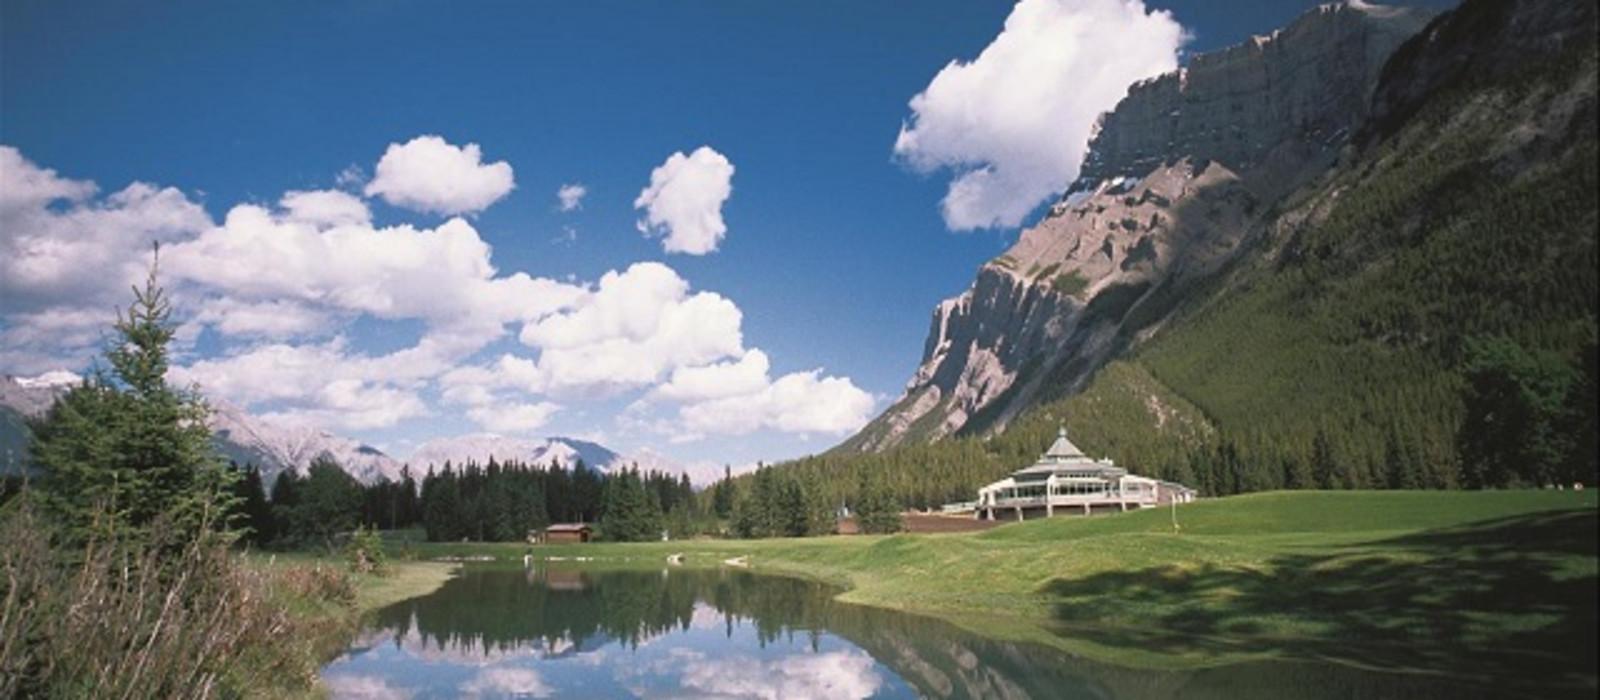 Hotel Fairmont Banff Springs Kanada